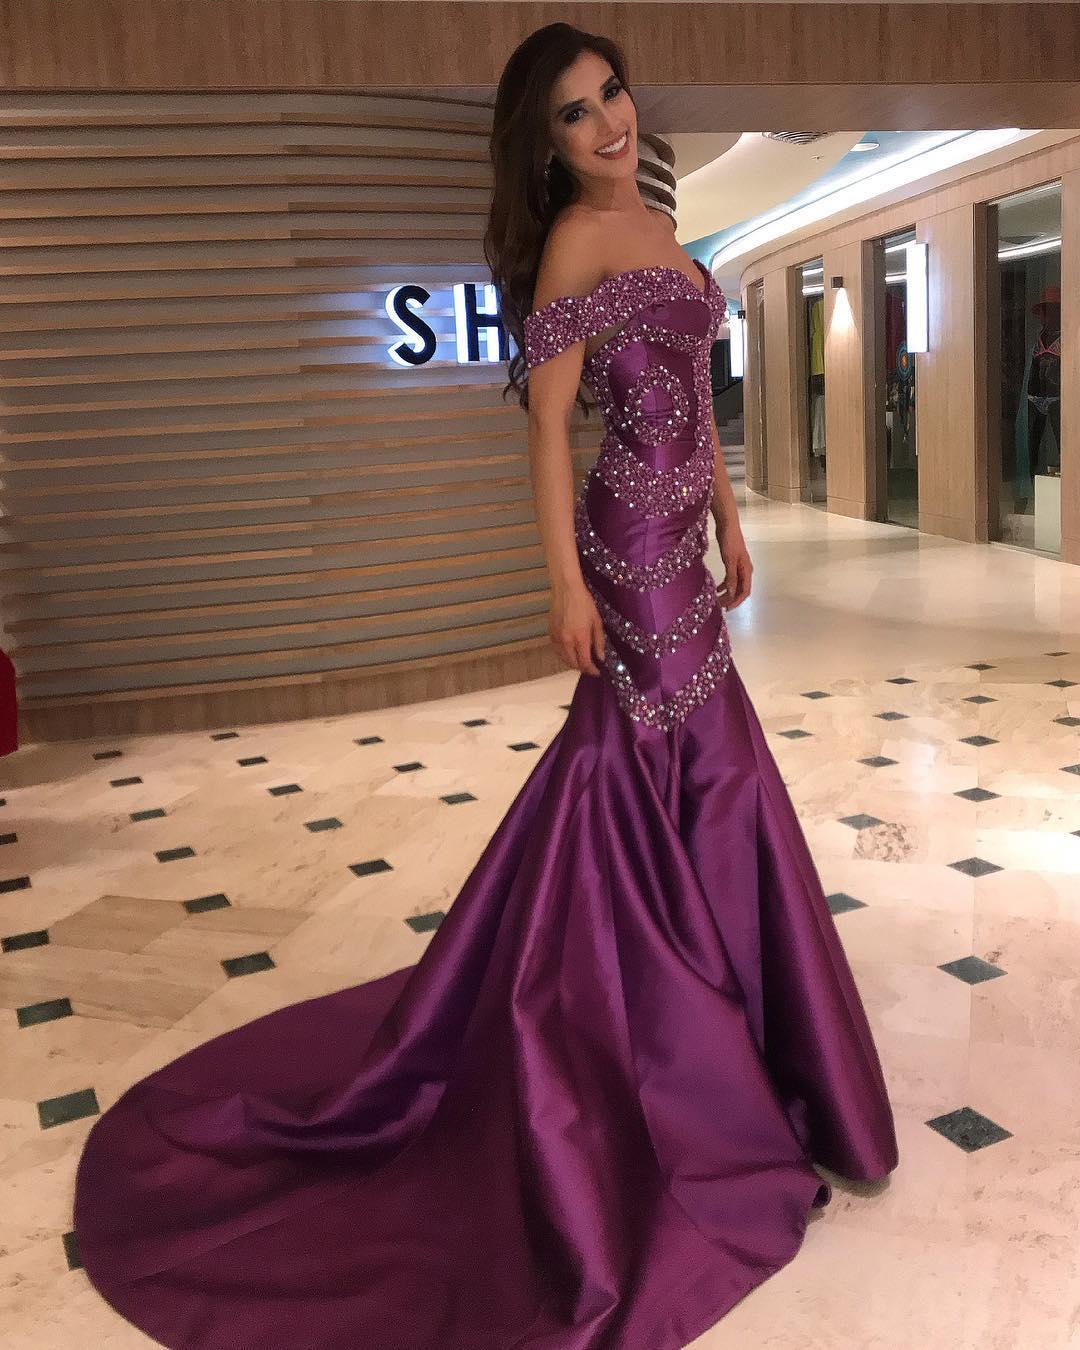 laura claro, primera finalista de reyna hispanoamericana 2019. 45418210